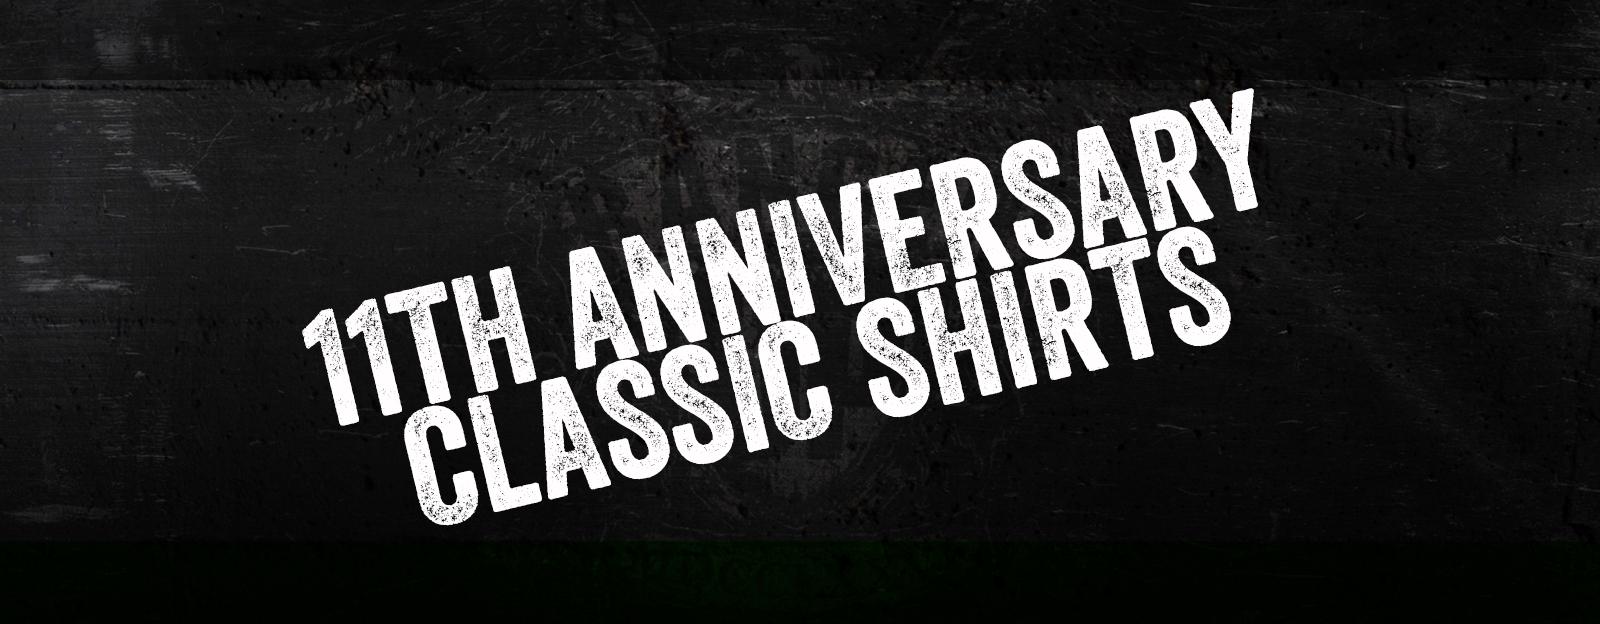 11th Anniversary Shirts